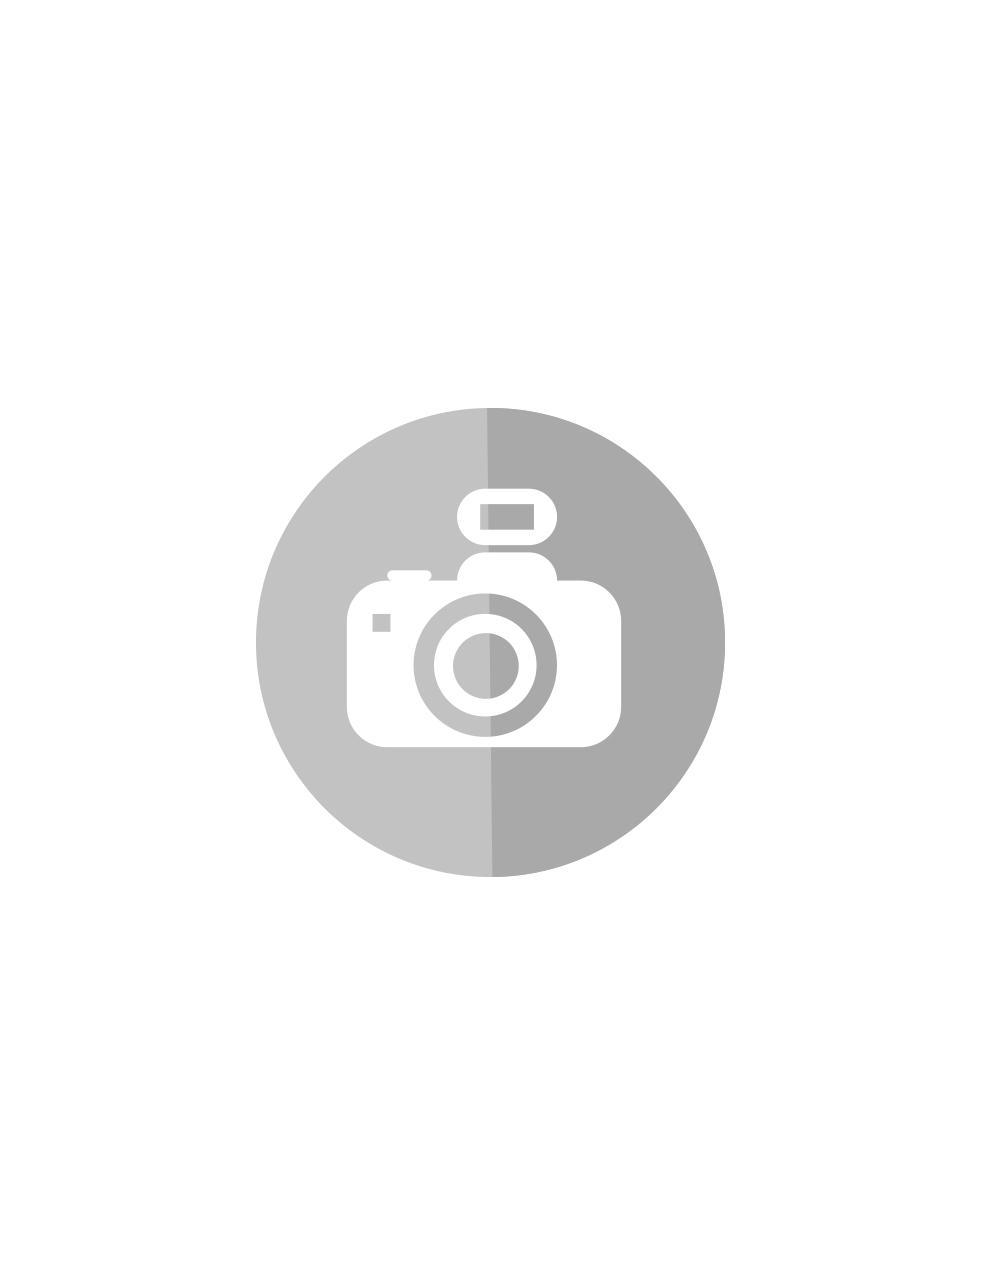 30049642_sparepart/Kindersitz-tragbar II